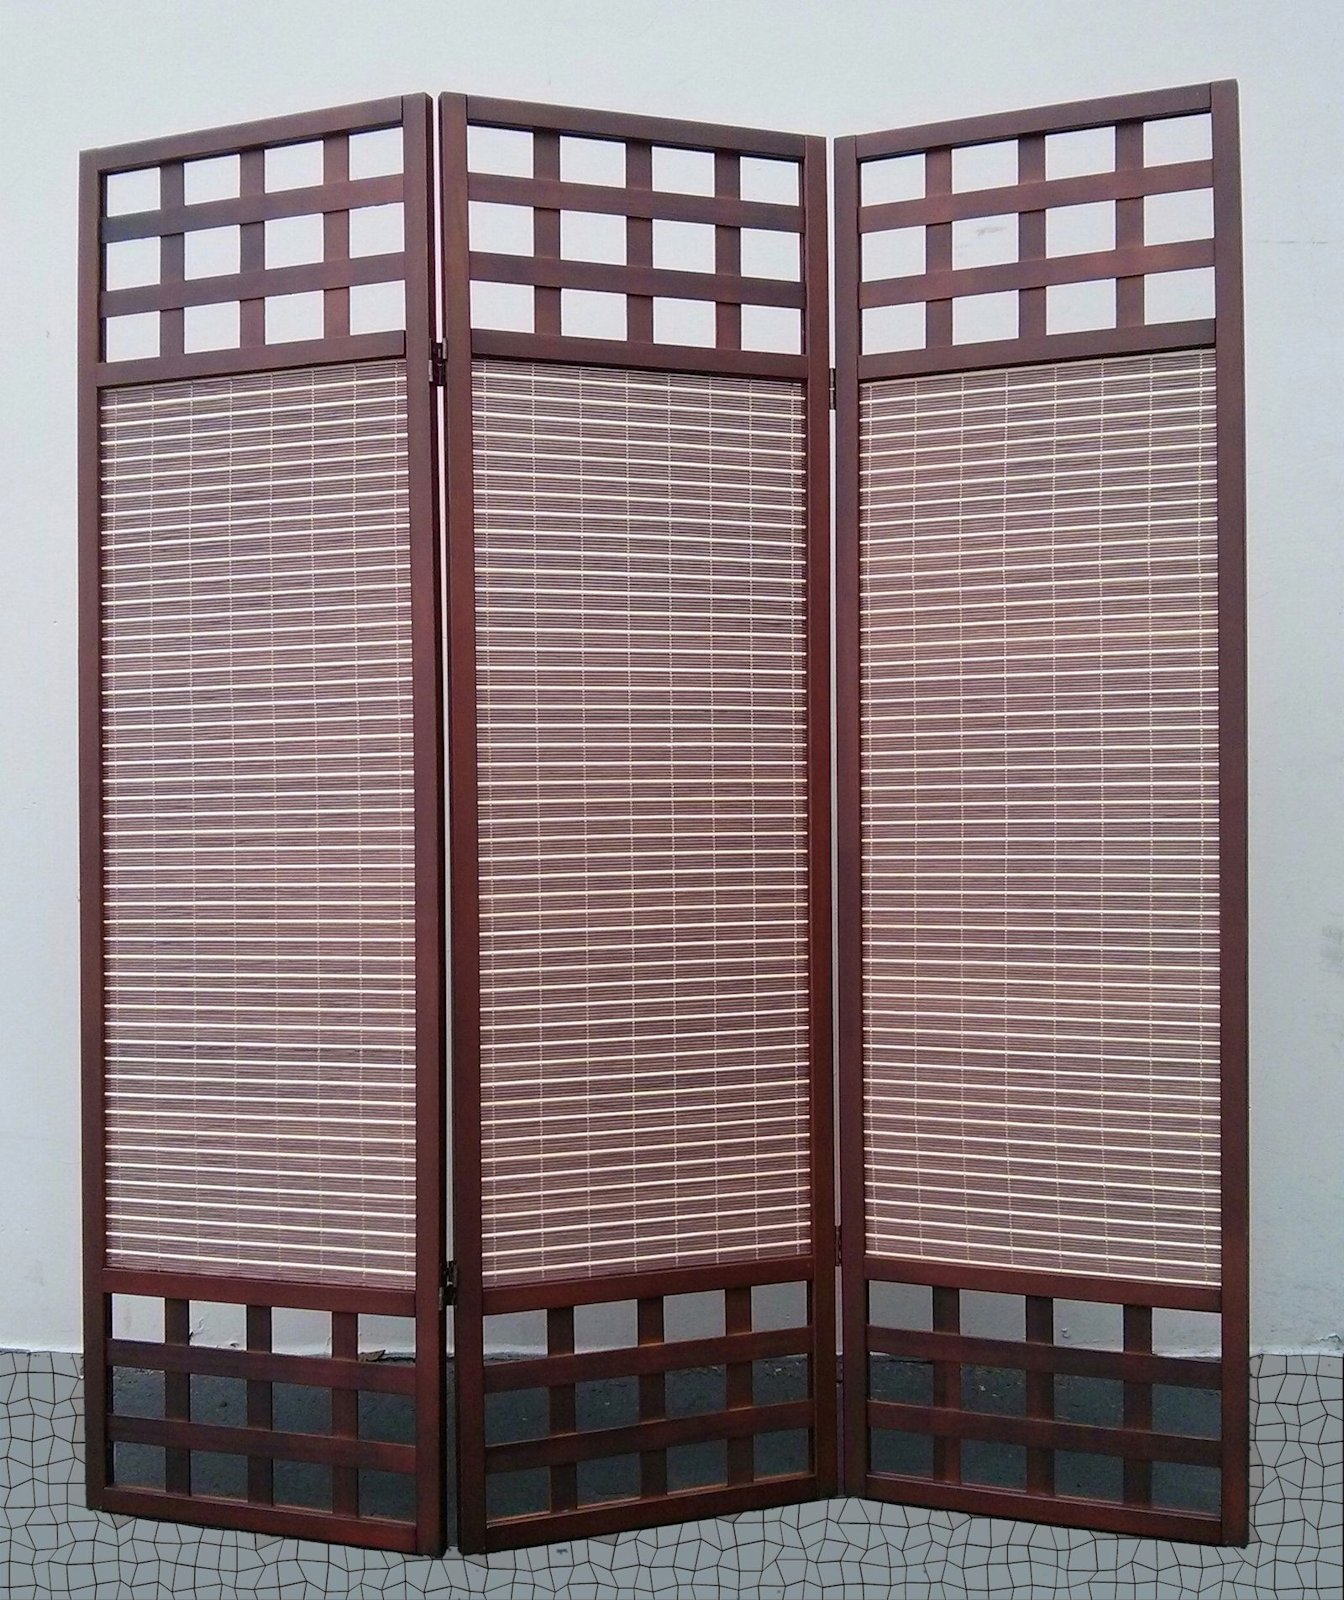 Legacy Decor 3 Panel Solid Wood Screen Room Divider, Dark Brown/Walnut Color